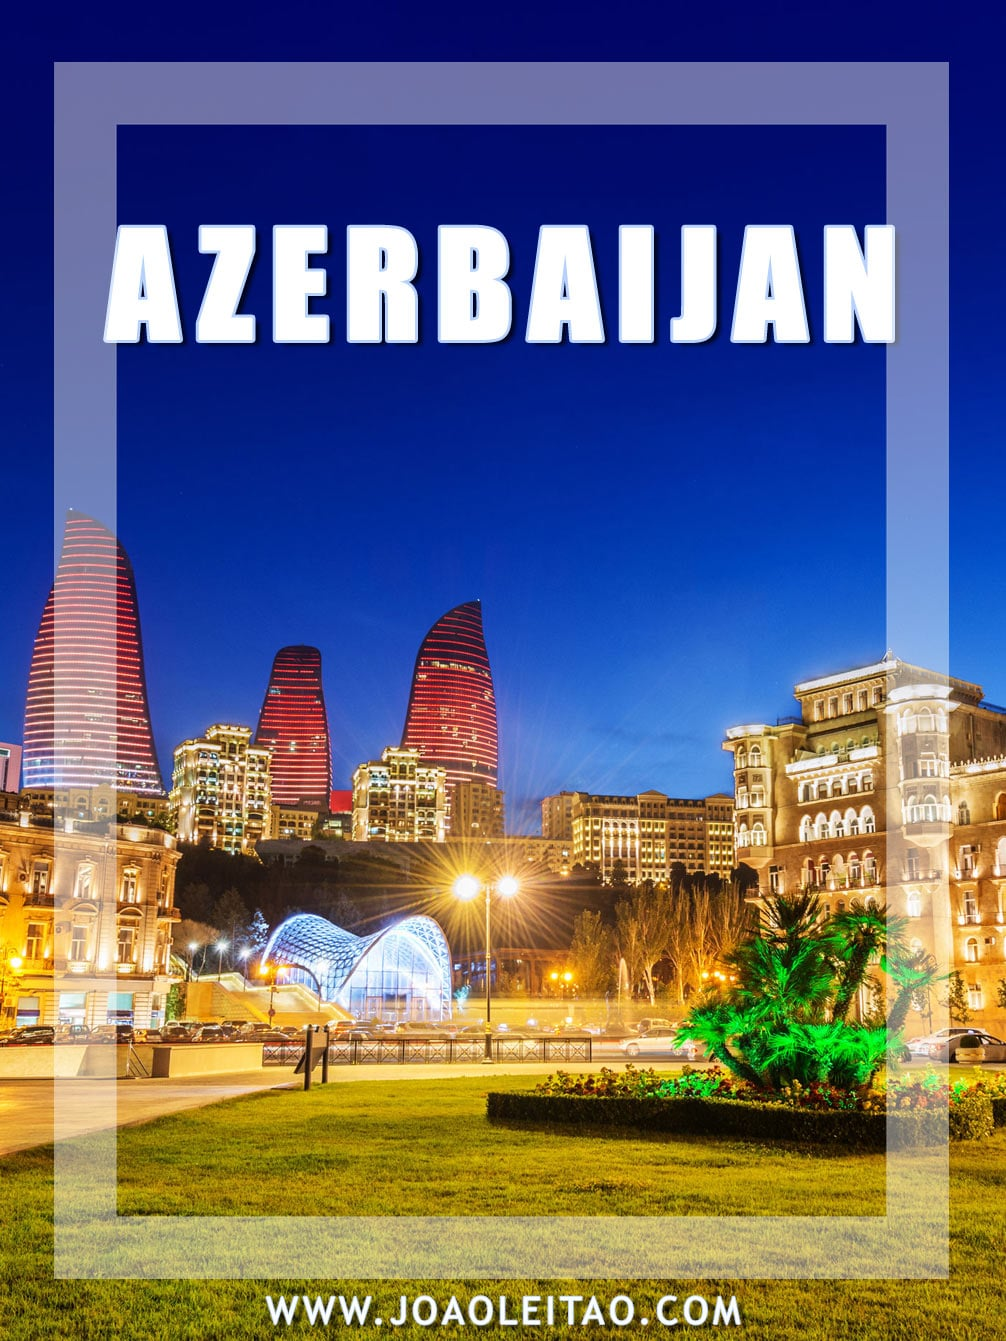 Tratamentul comun Azerbaidjan